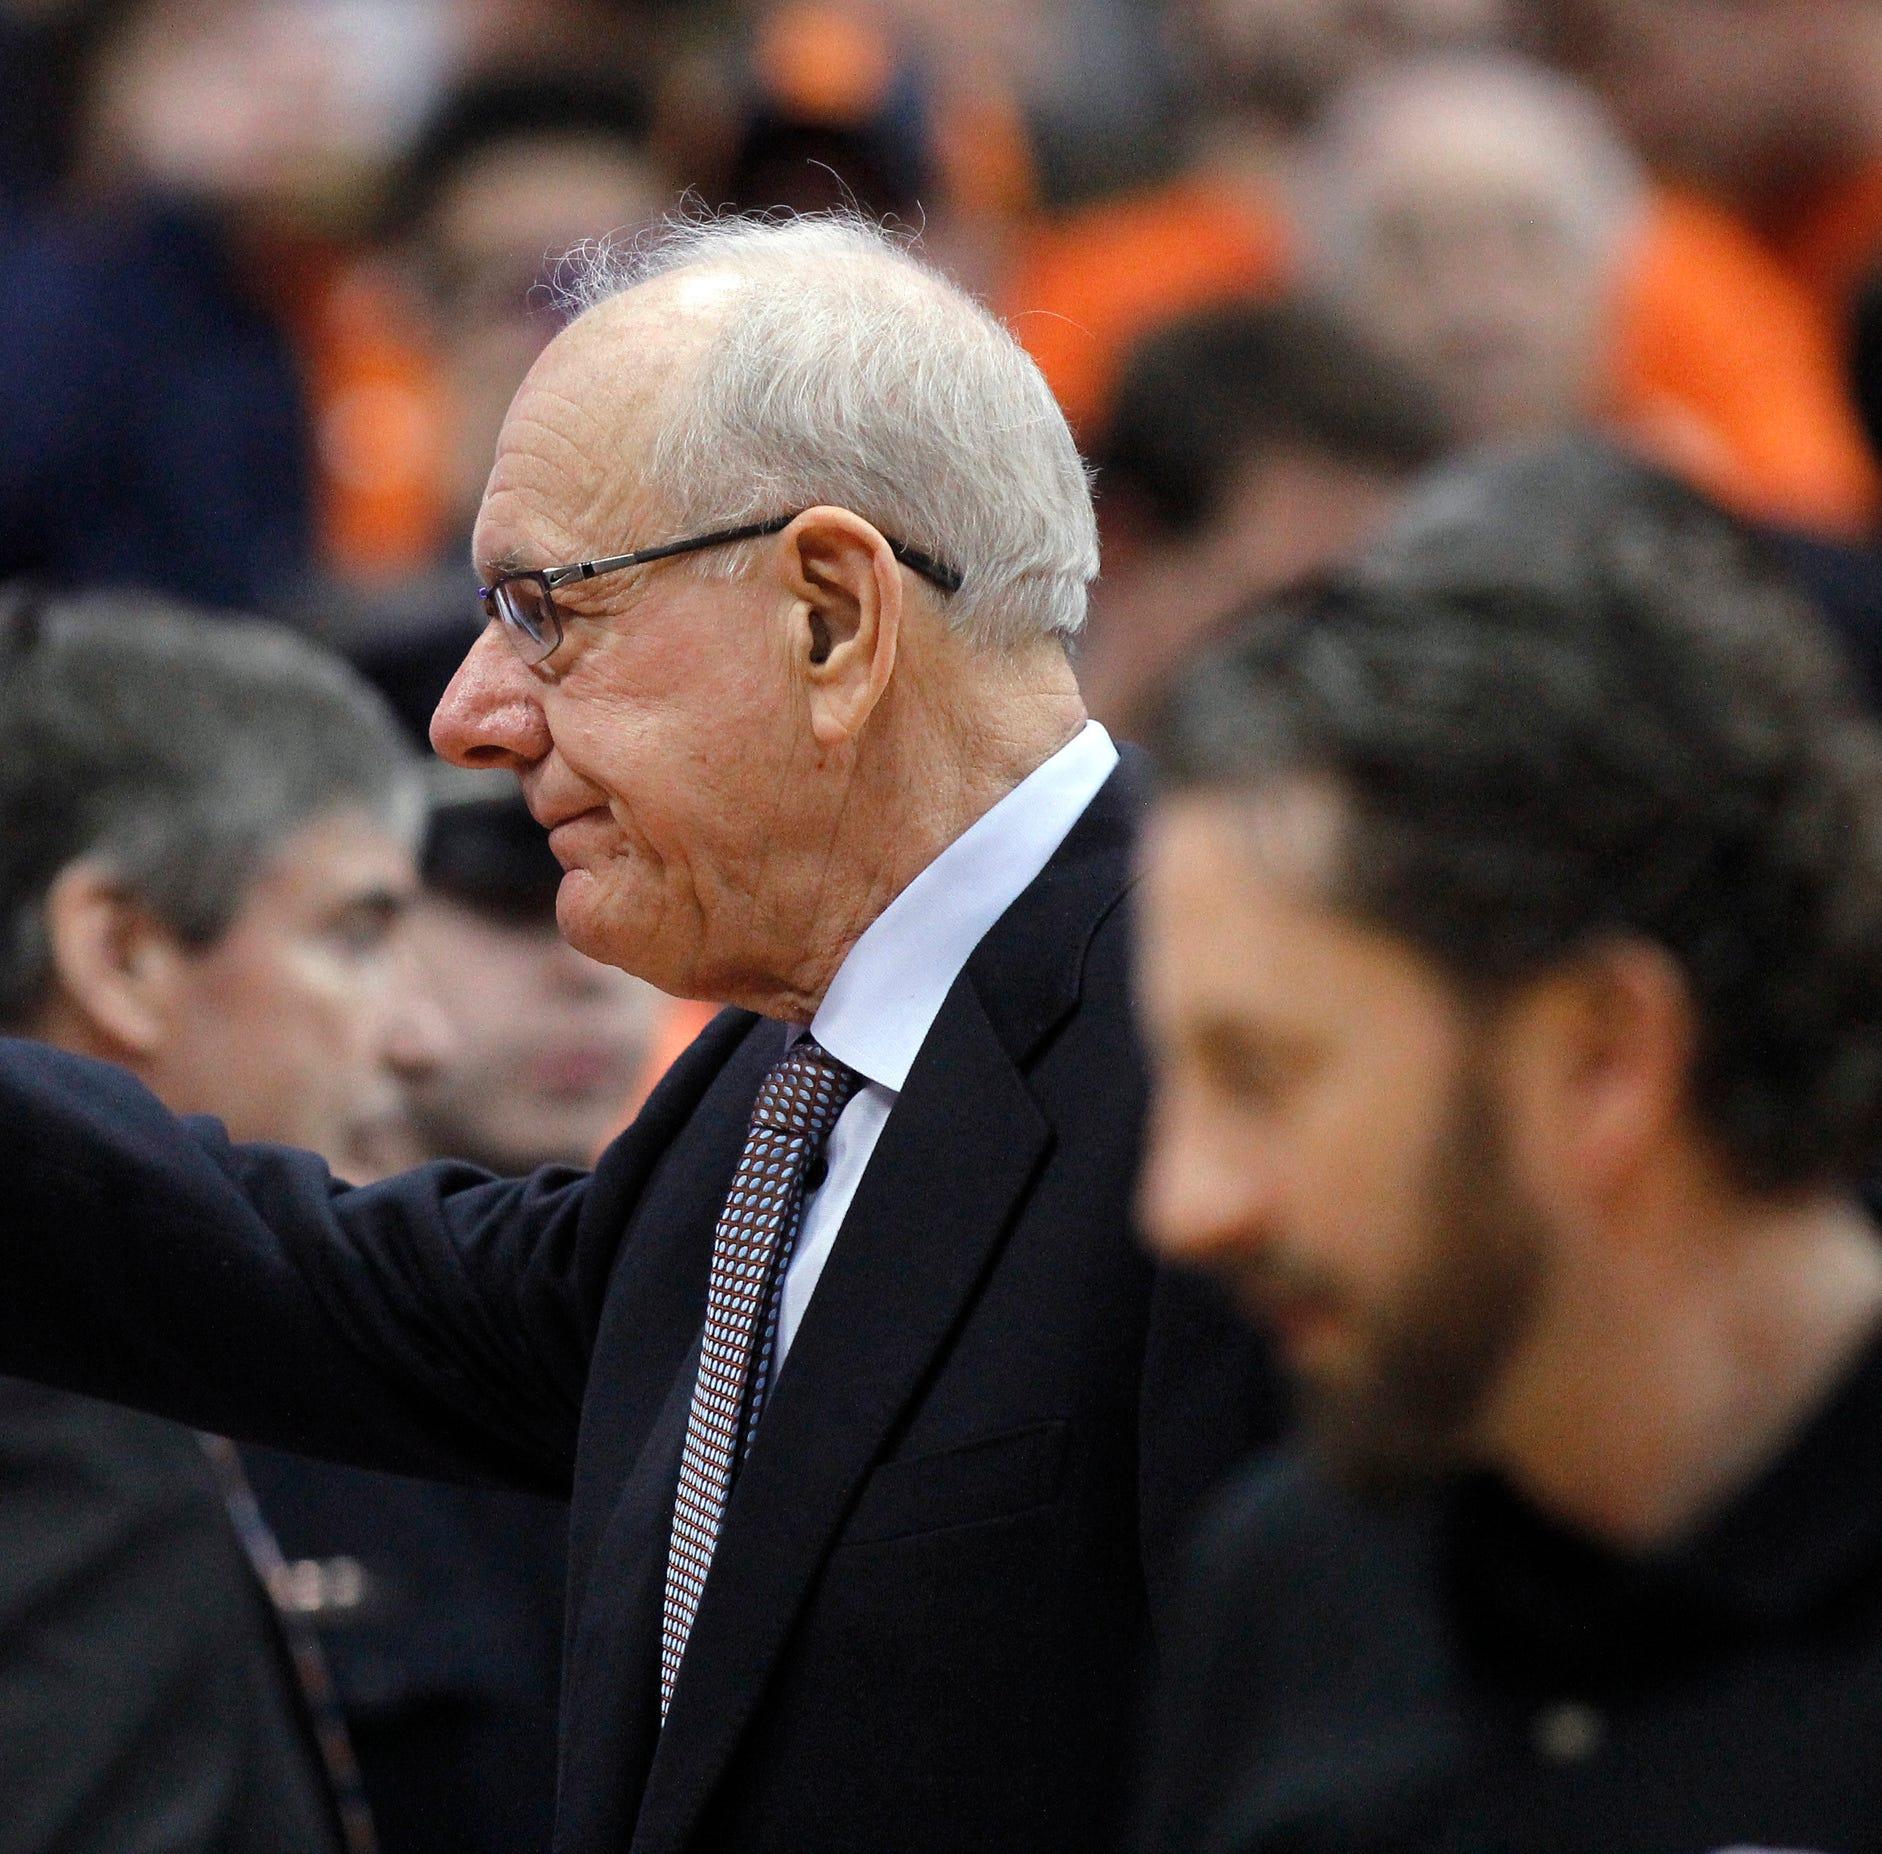 Jim Boeheim gets standing ovation before Duke game; Syracuse honors man killed in crash